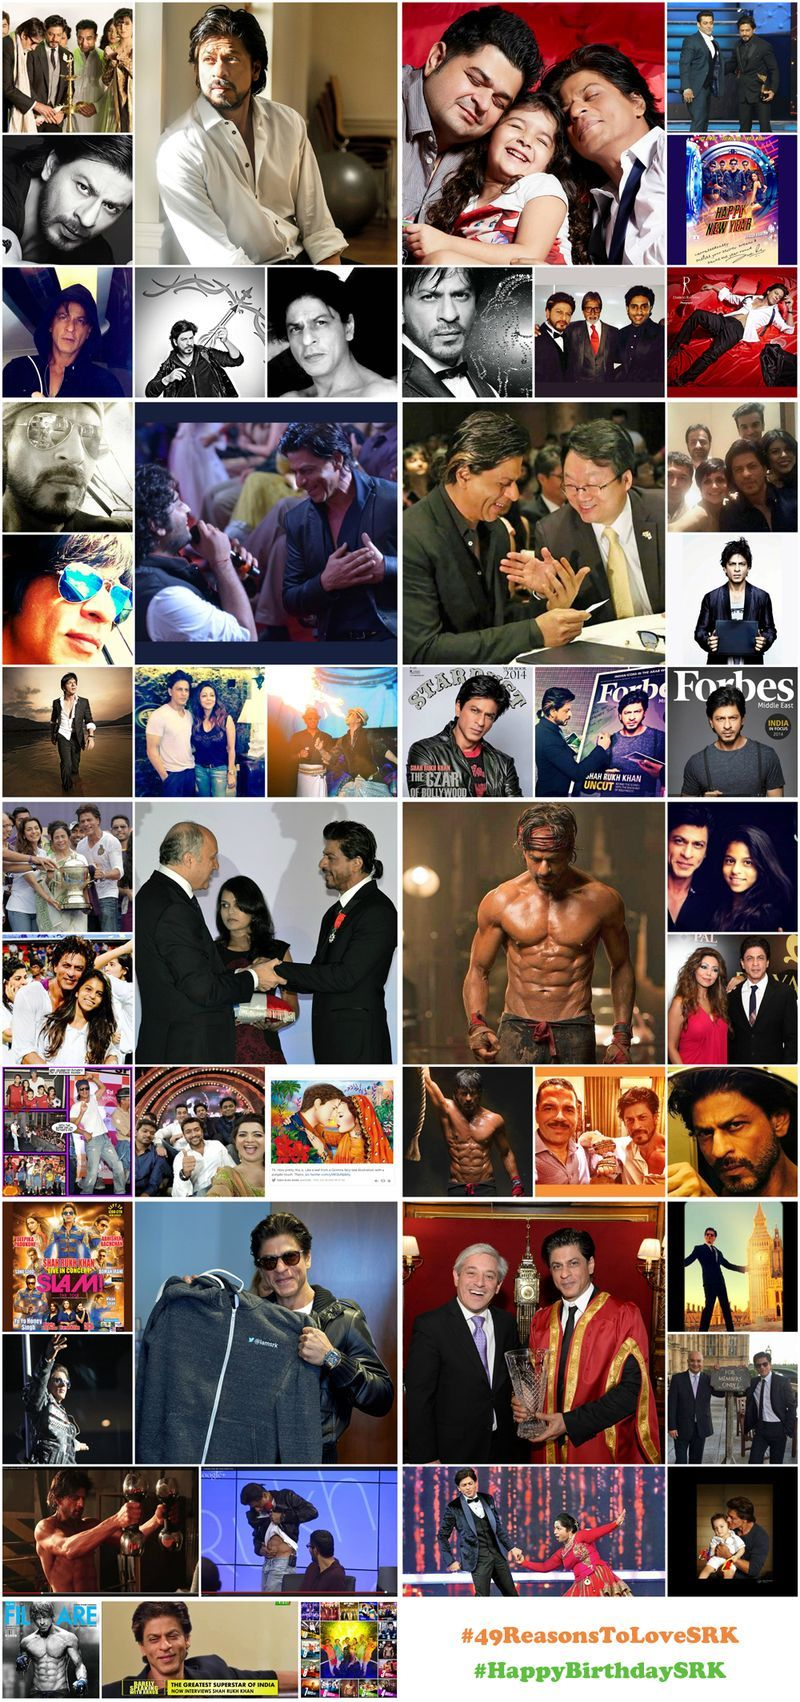 Happy Birthday, Shah Rukh Khan! 49 Reasons to Love SRK